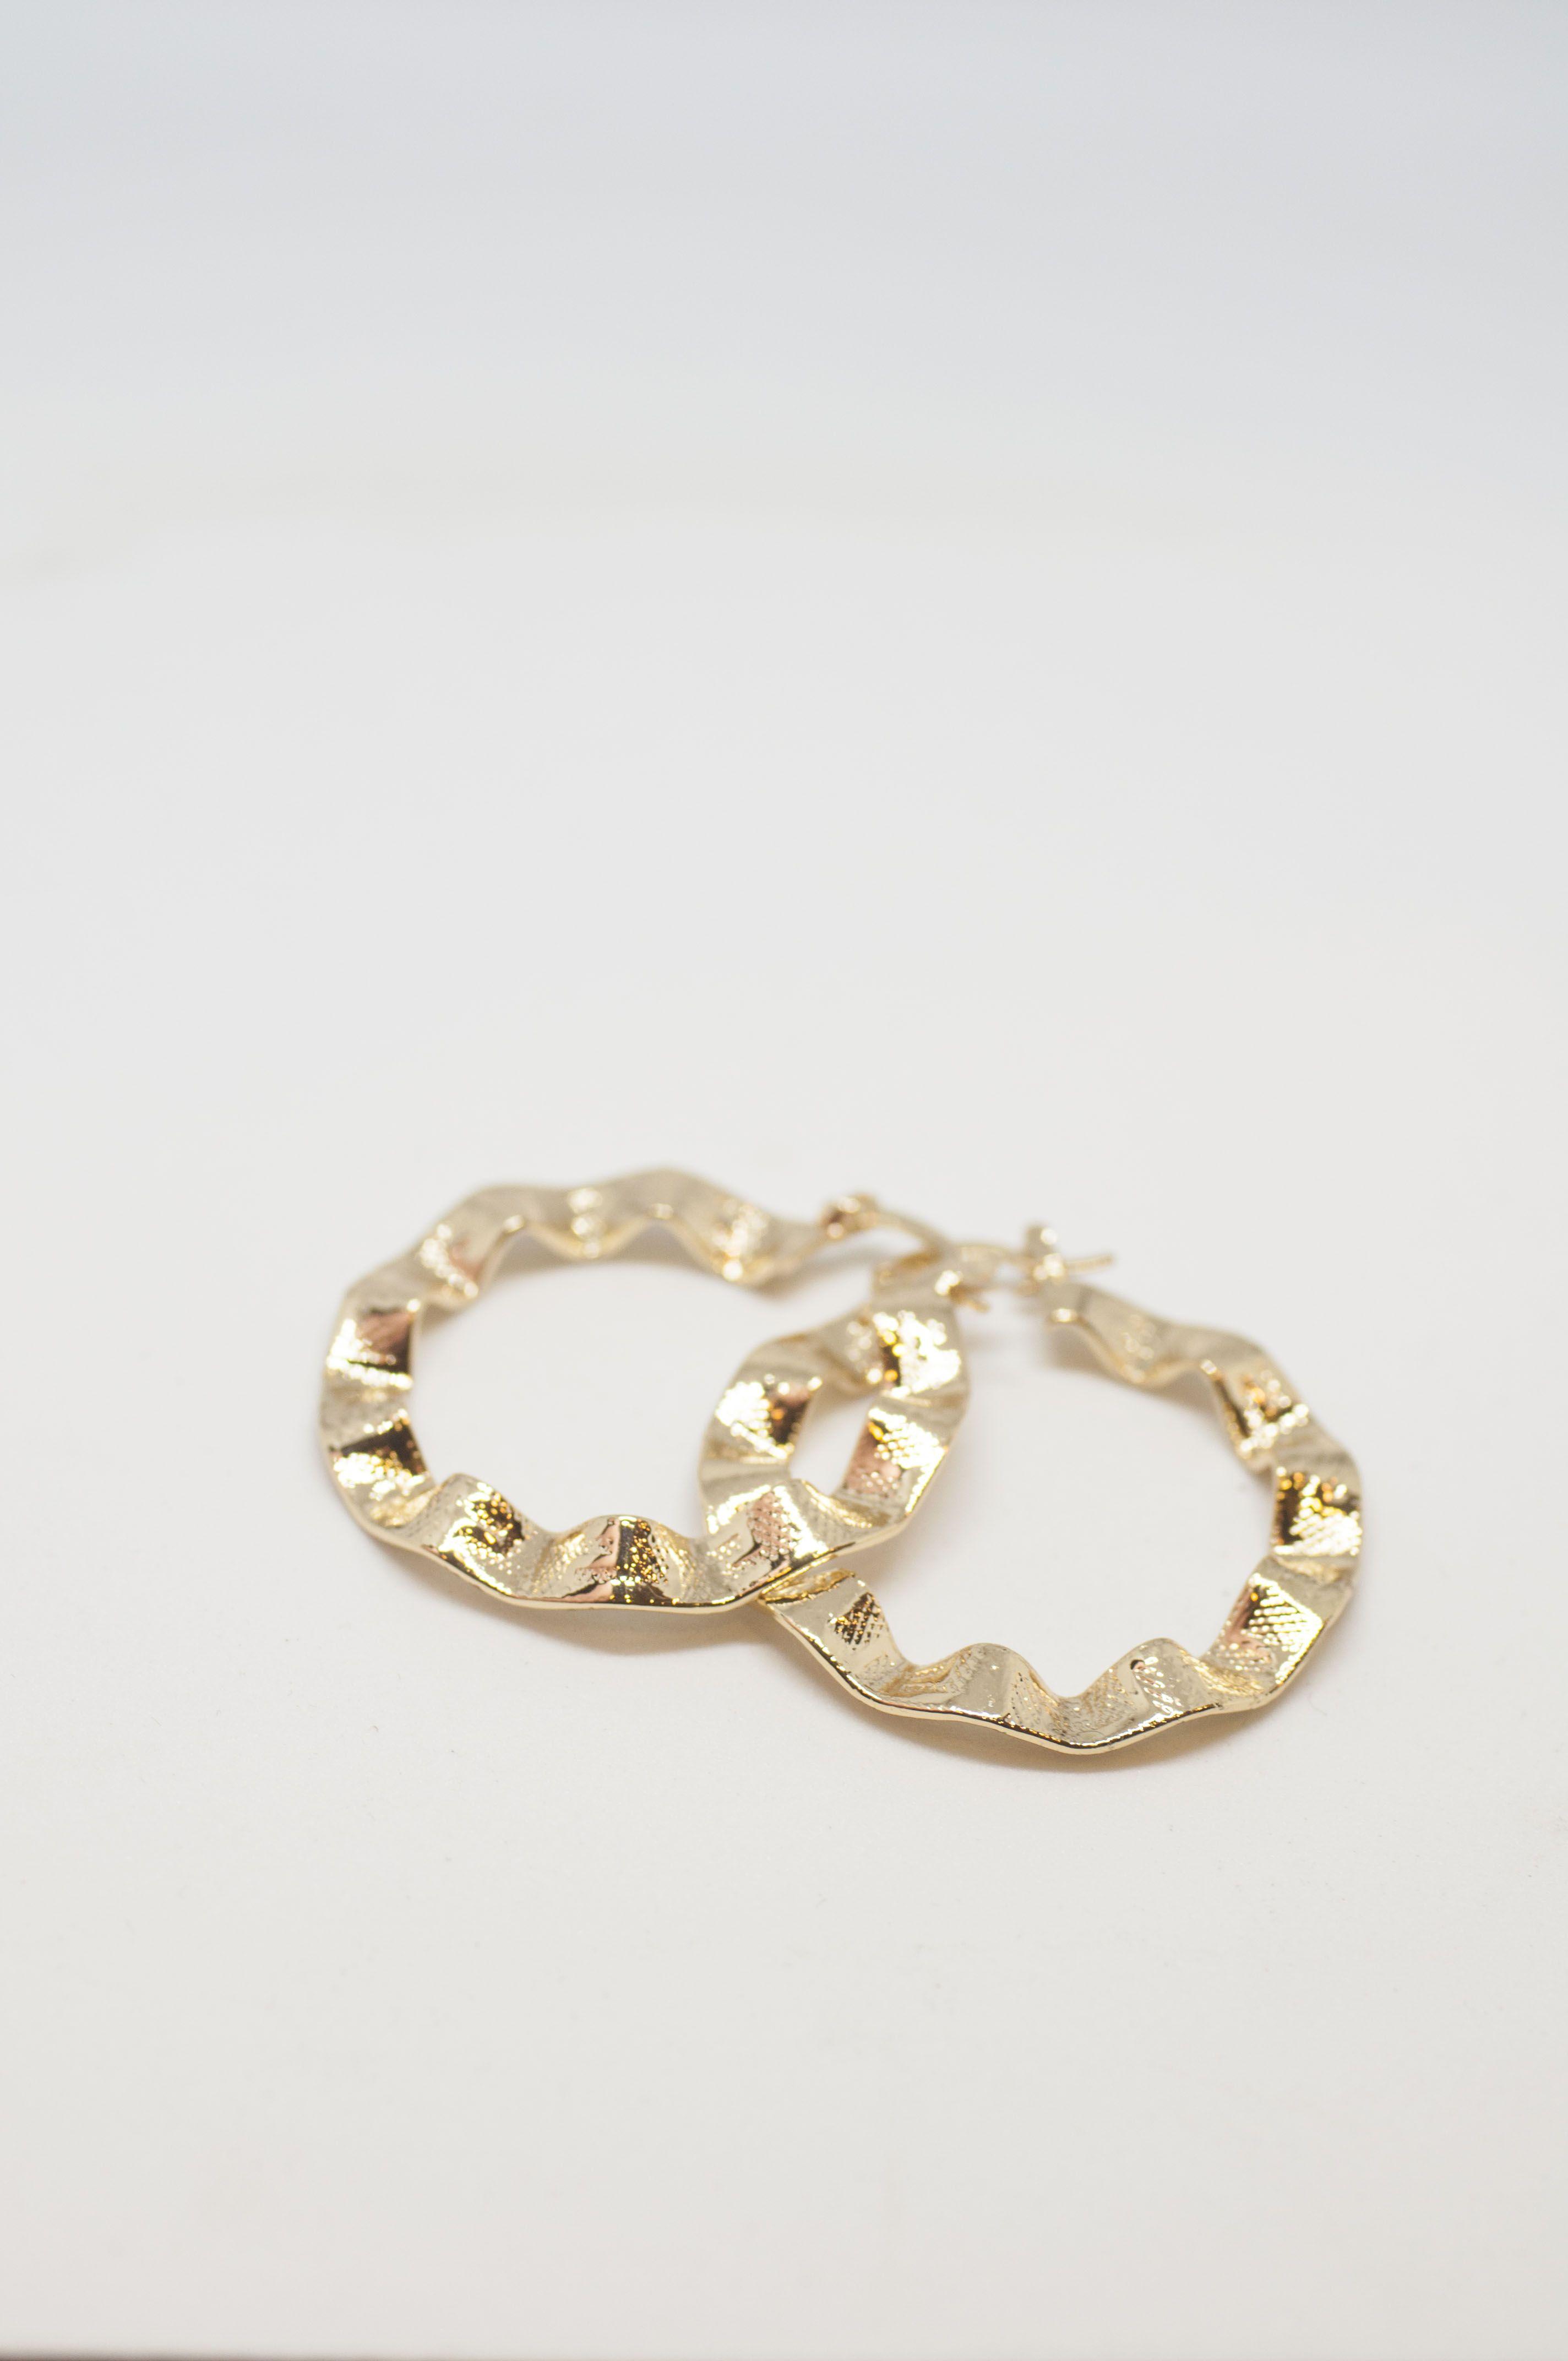 Folded Gold Hoop Earrings Fashion Geometric Statement Jewelry Handmade Gift For Her Bbold